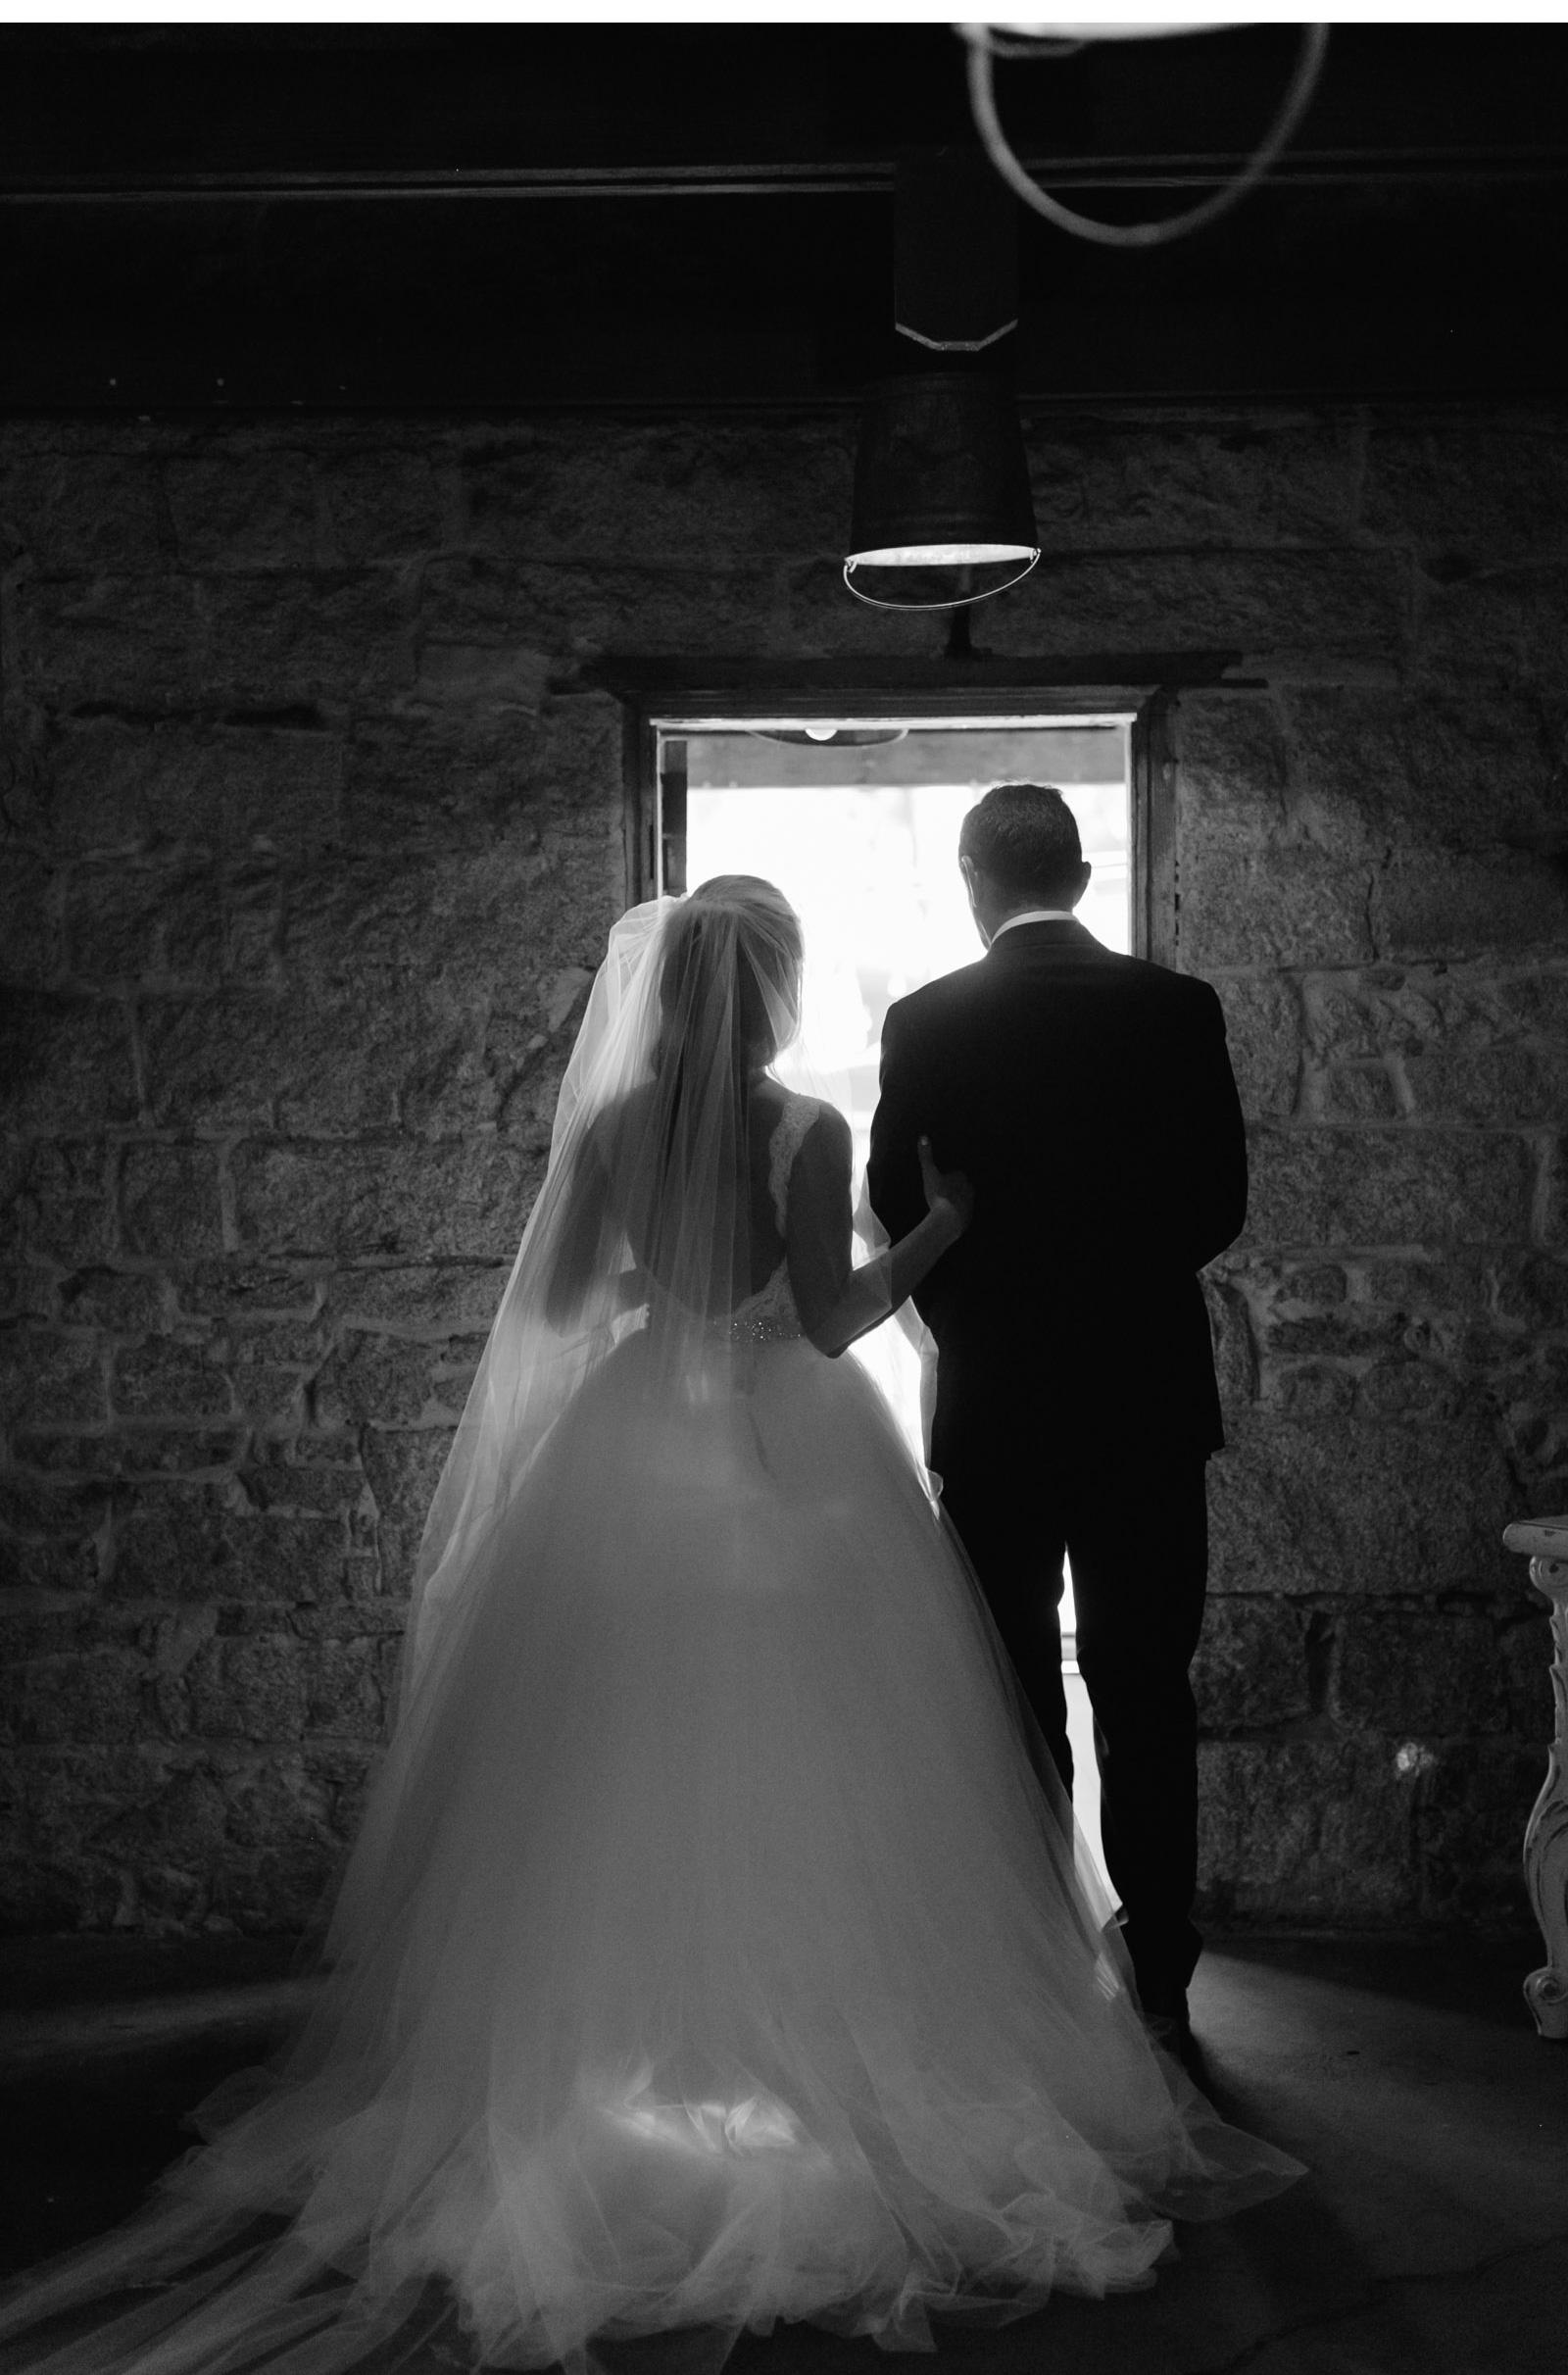 Temecula-Wedding-Miss-USA-Nia-Booko-Natalie-Schutt-Photography_01.jpg